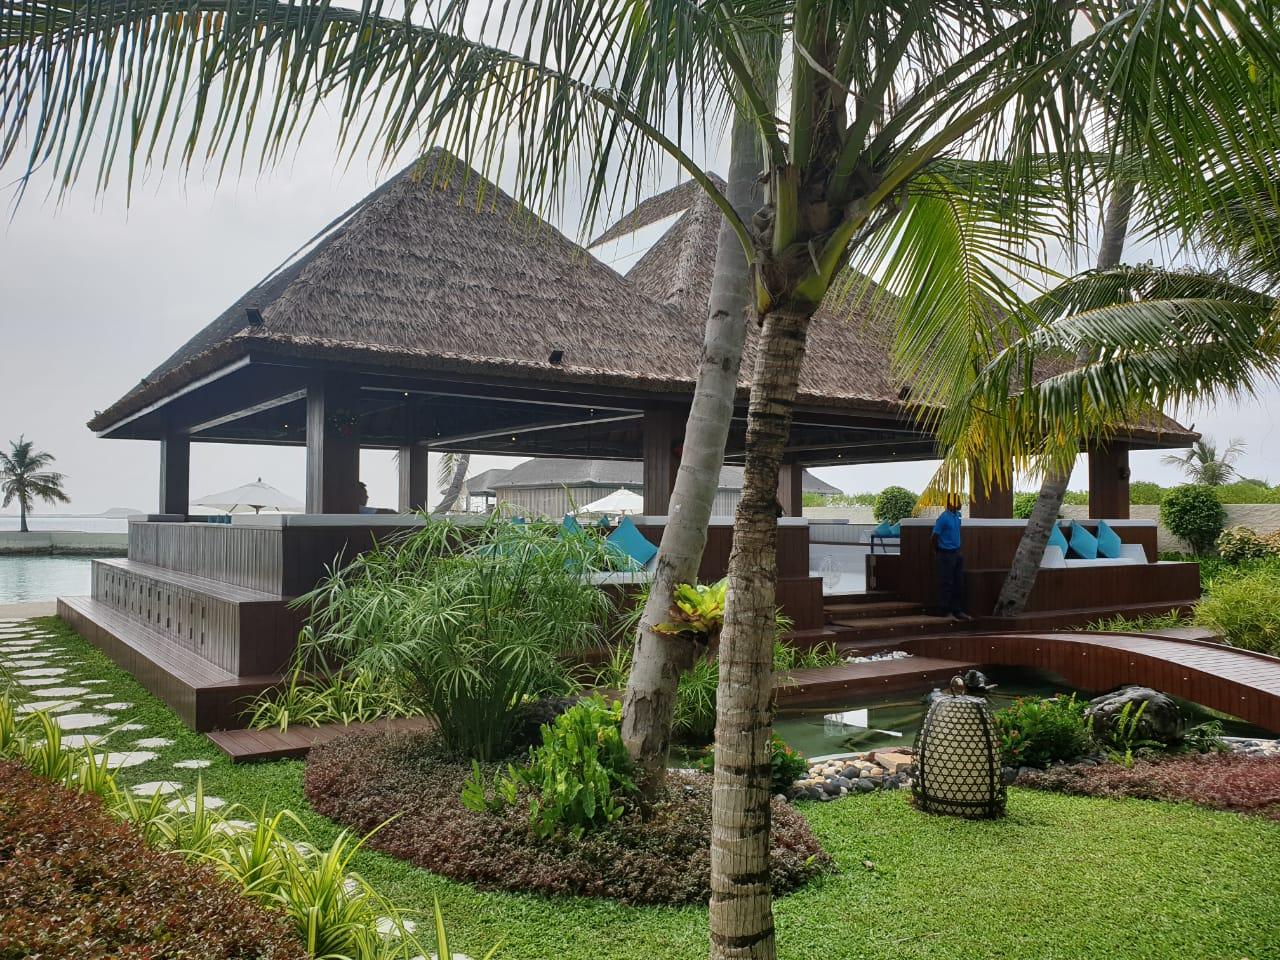 Fiber Thatch Maldives_Jurmeirah Vittaveli Resort 02